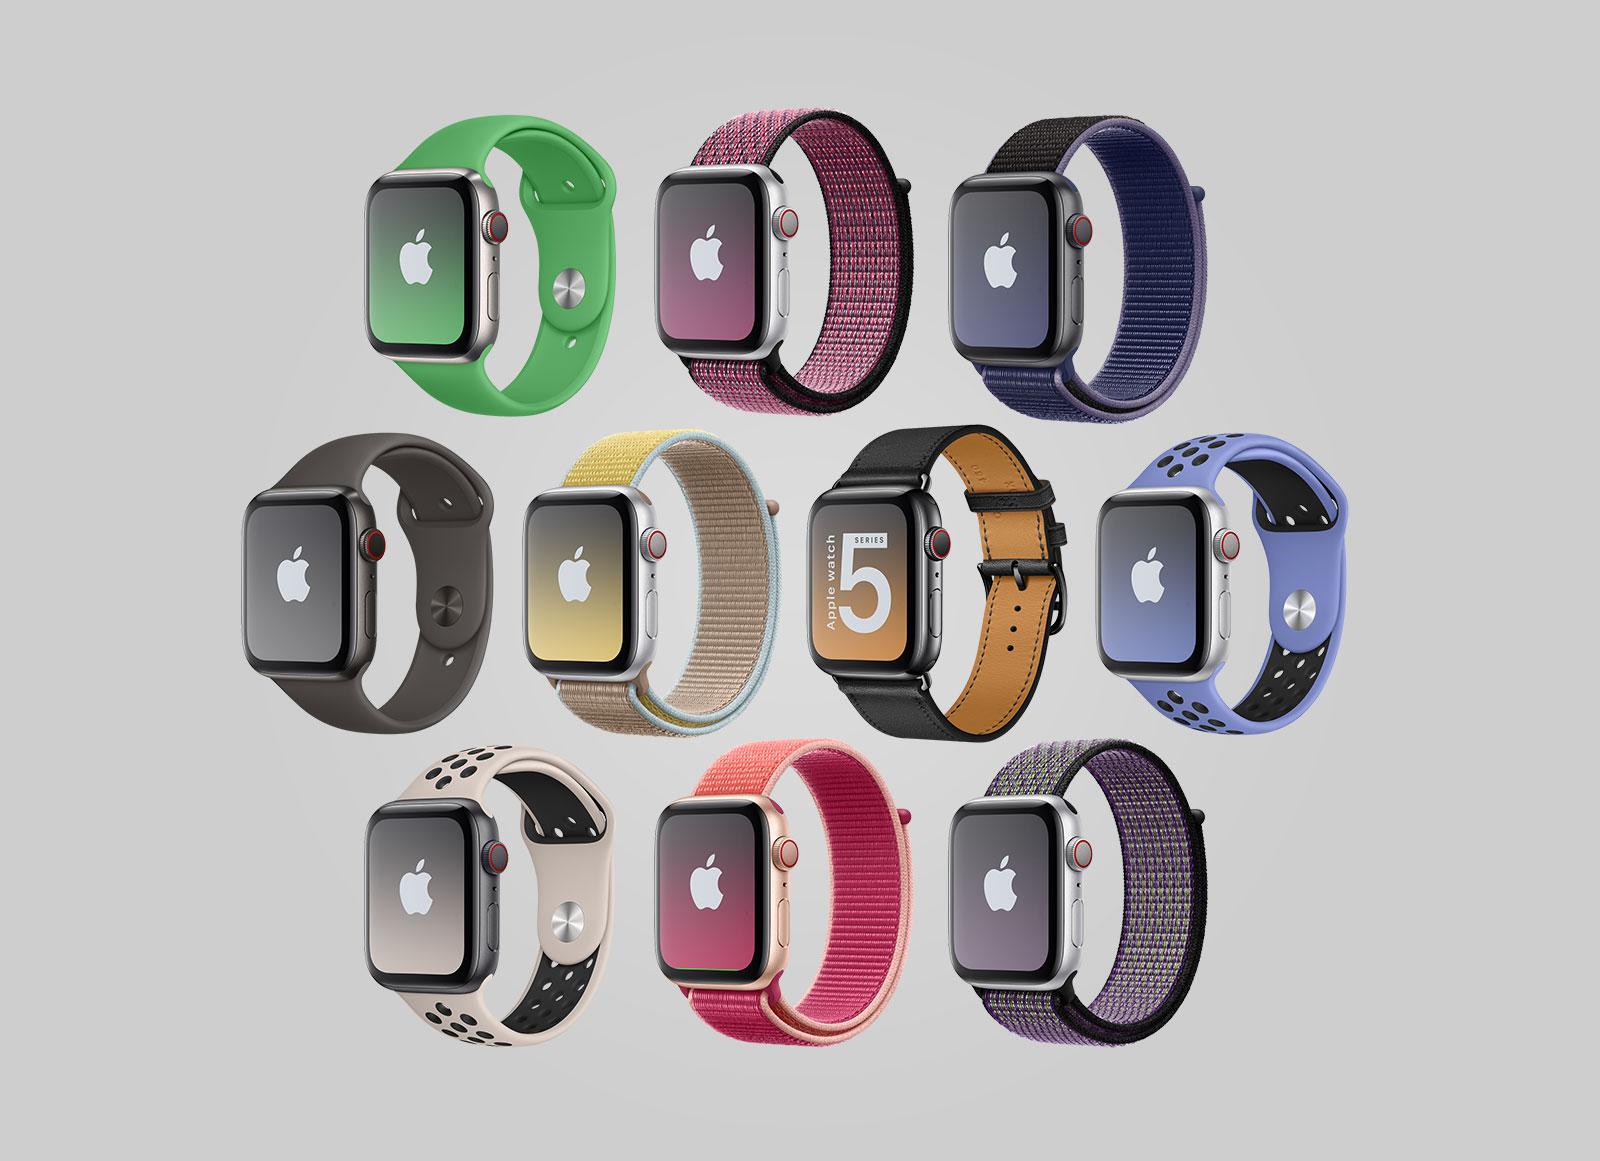 Free-Apple-Watch-Series-5-Mockup-PSD